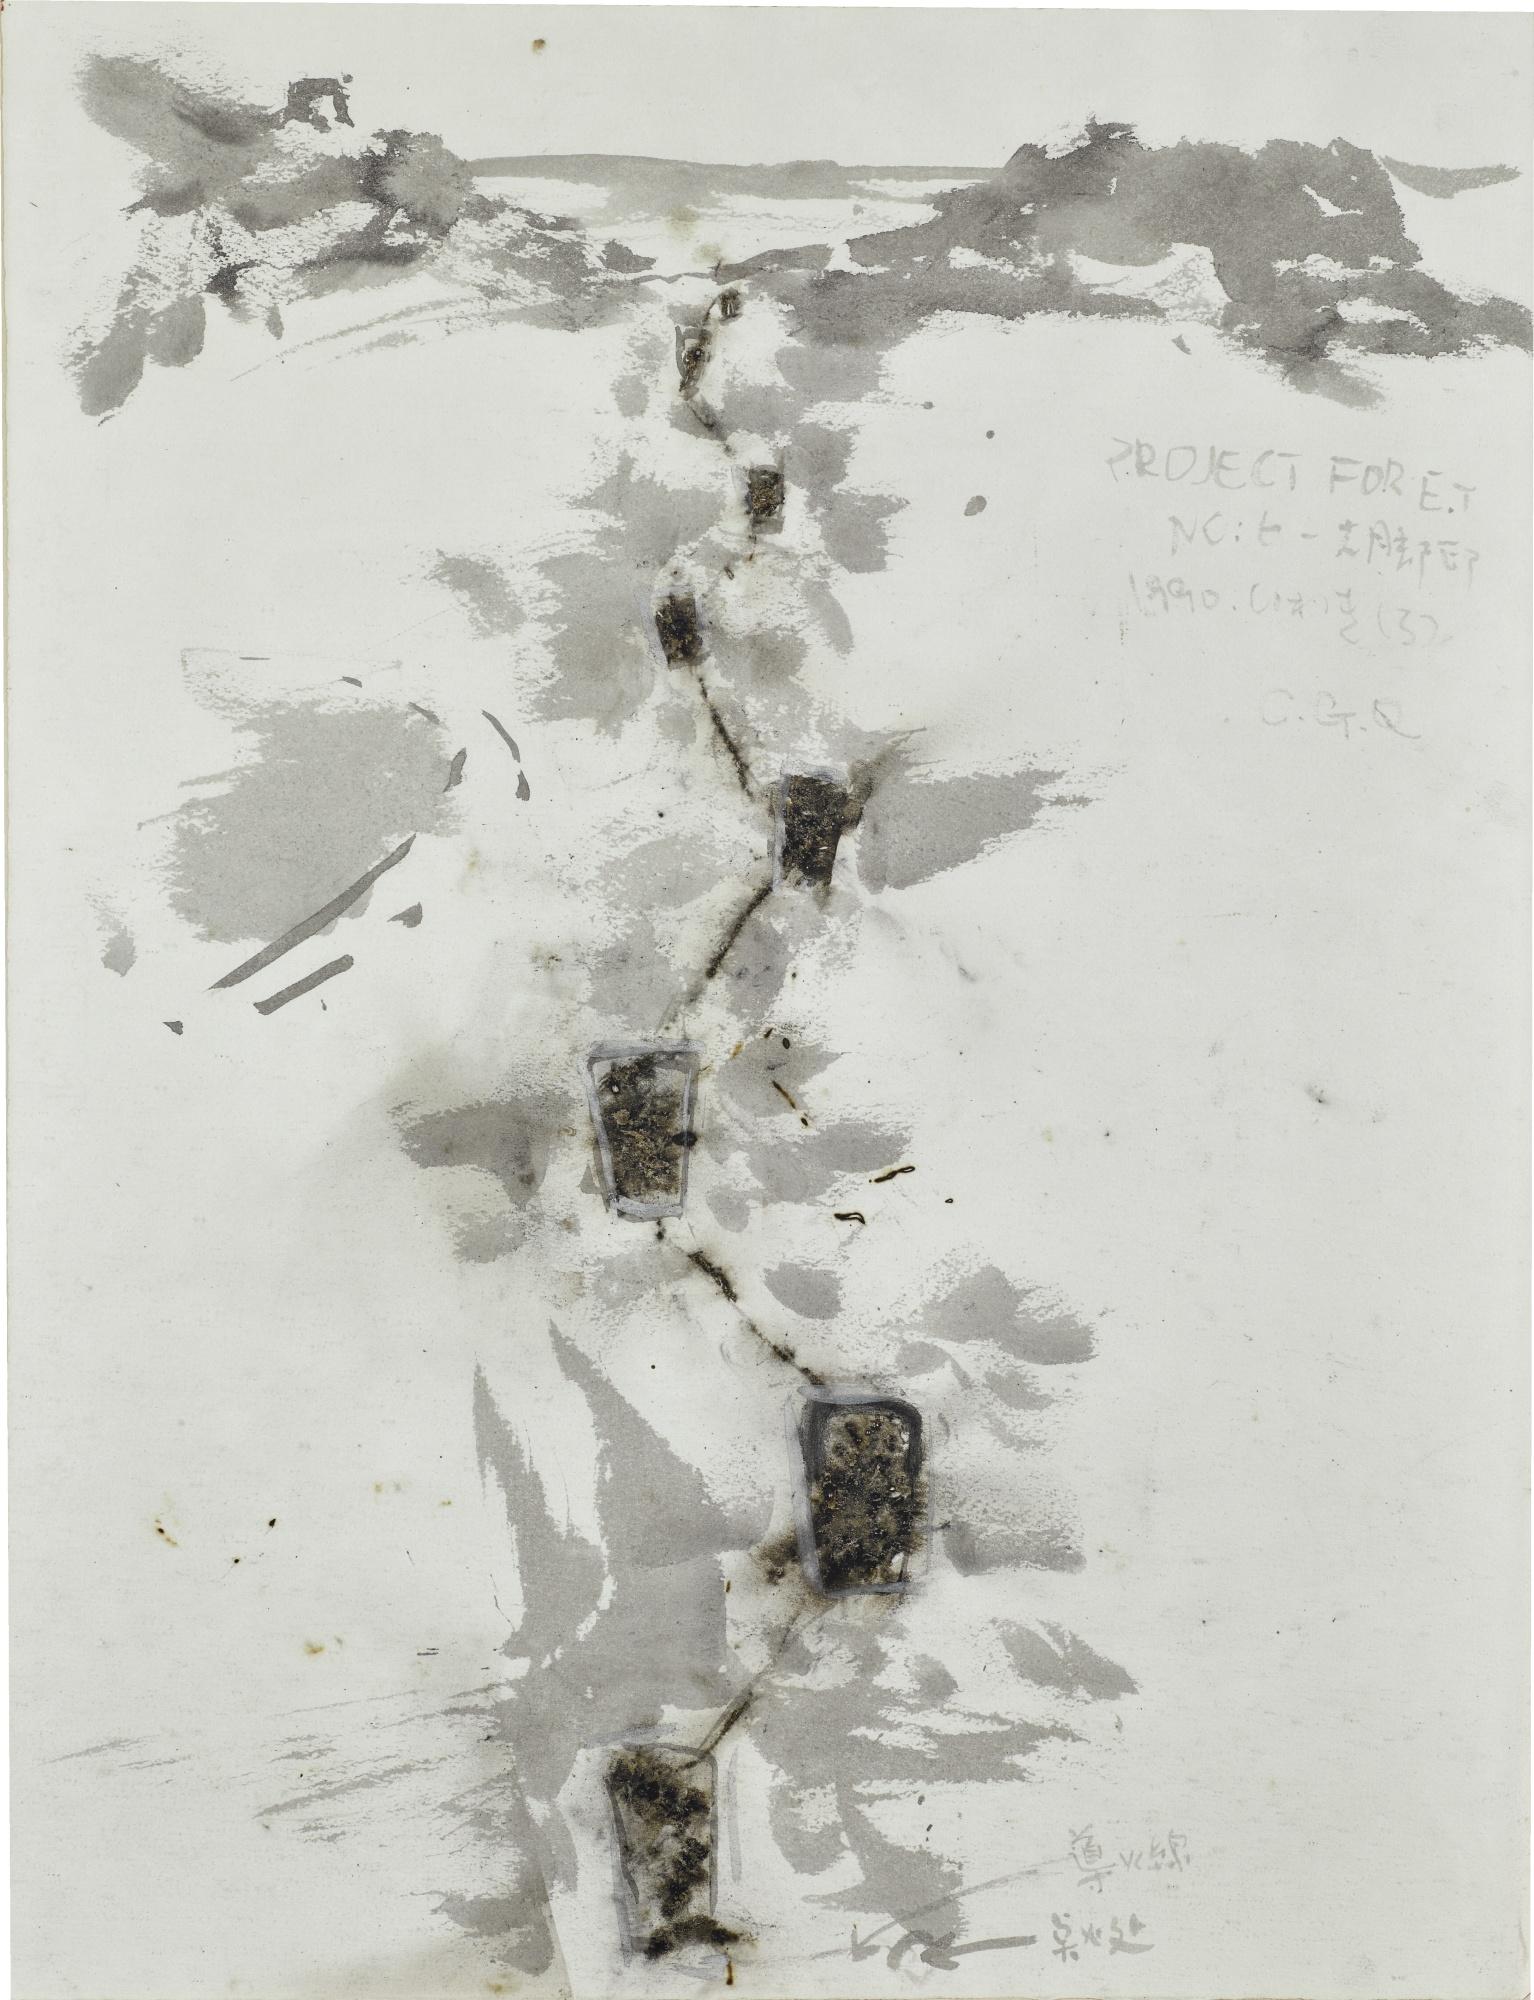 Cai Guo-Qiang-Big Footprints: Project For Extraterrestrials No. 6-1990